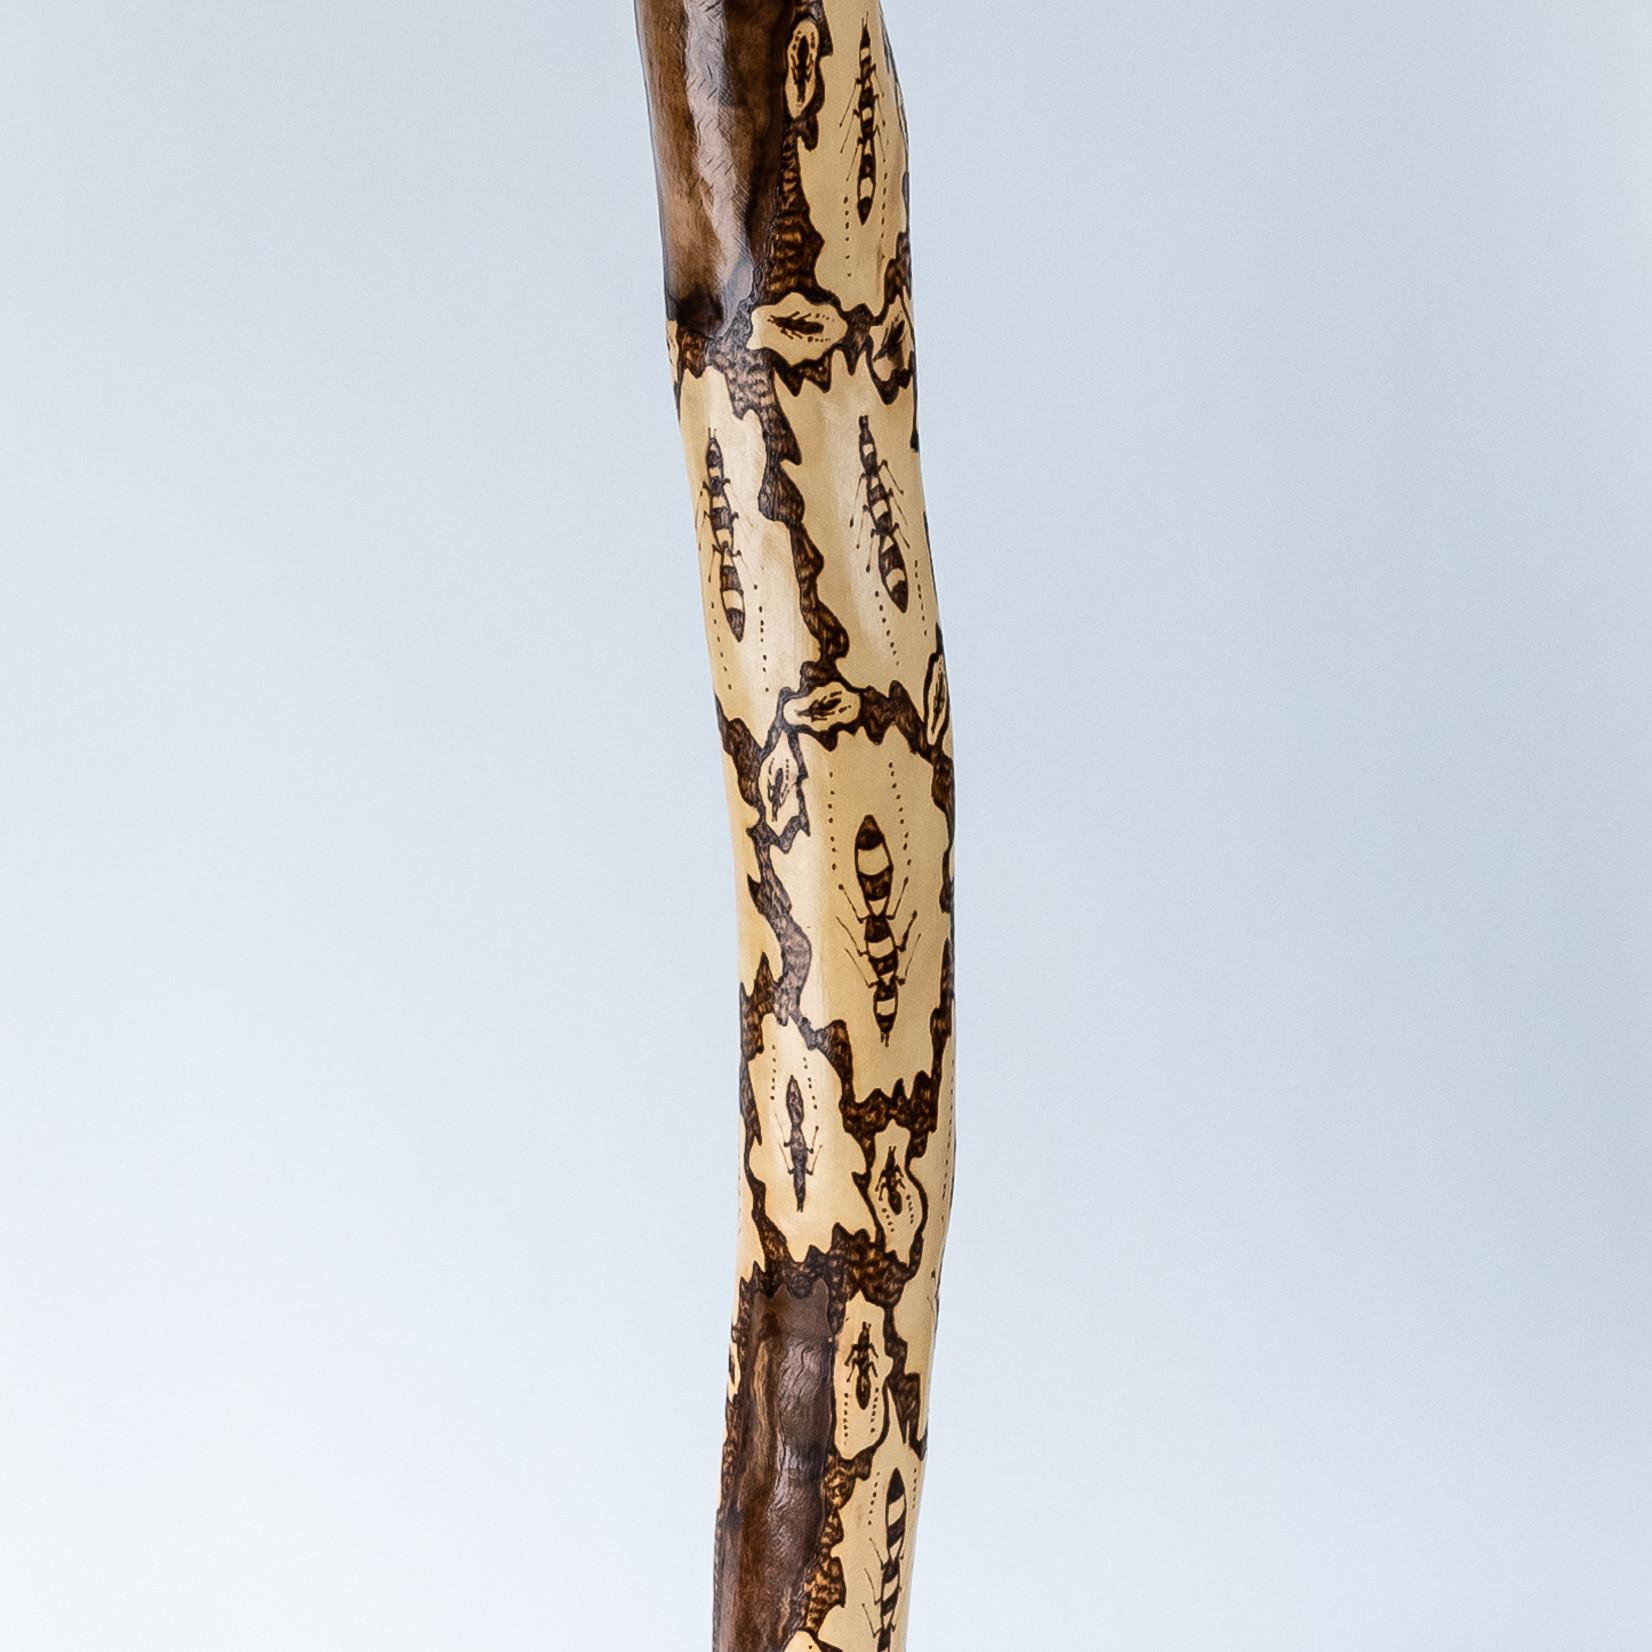 Oswald Egan Didgeridoo - Uncle Oswald Egan